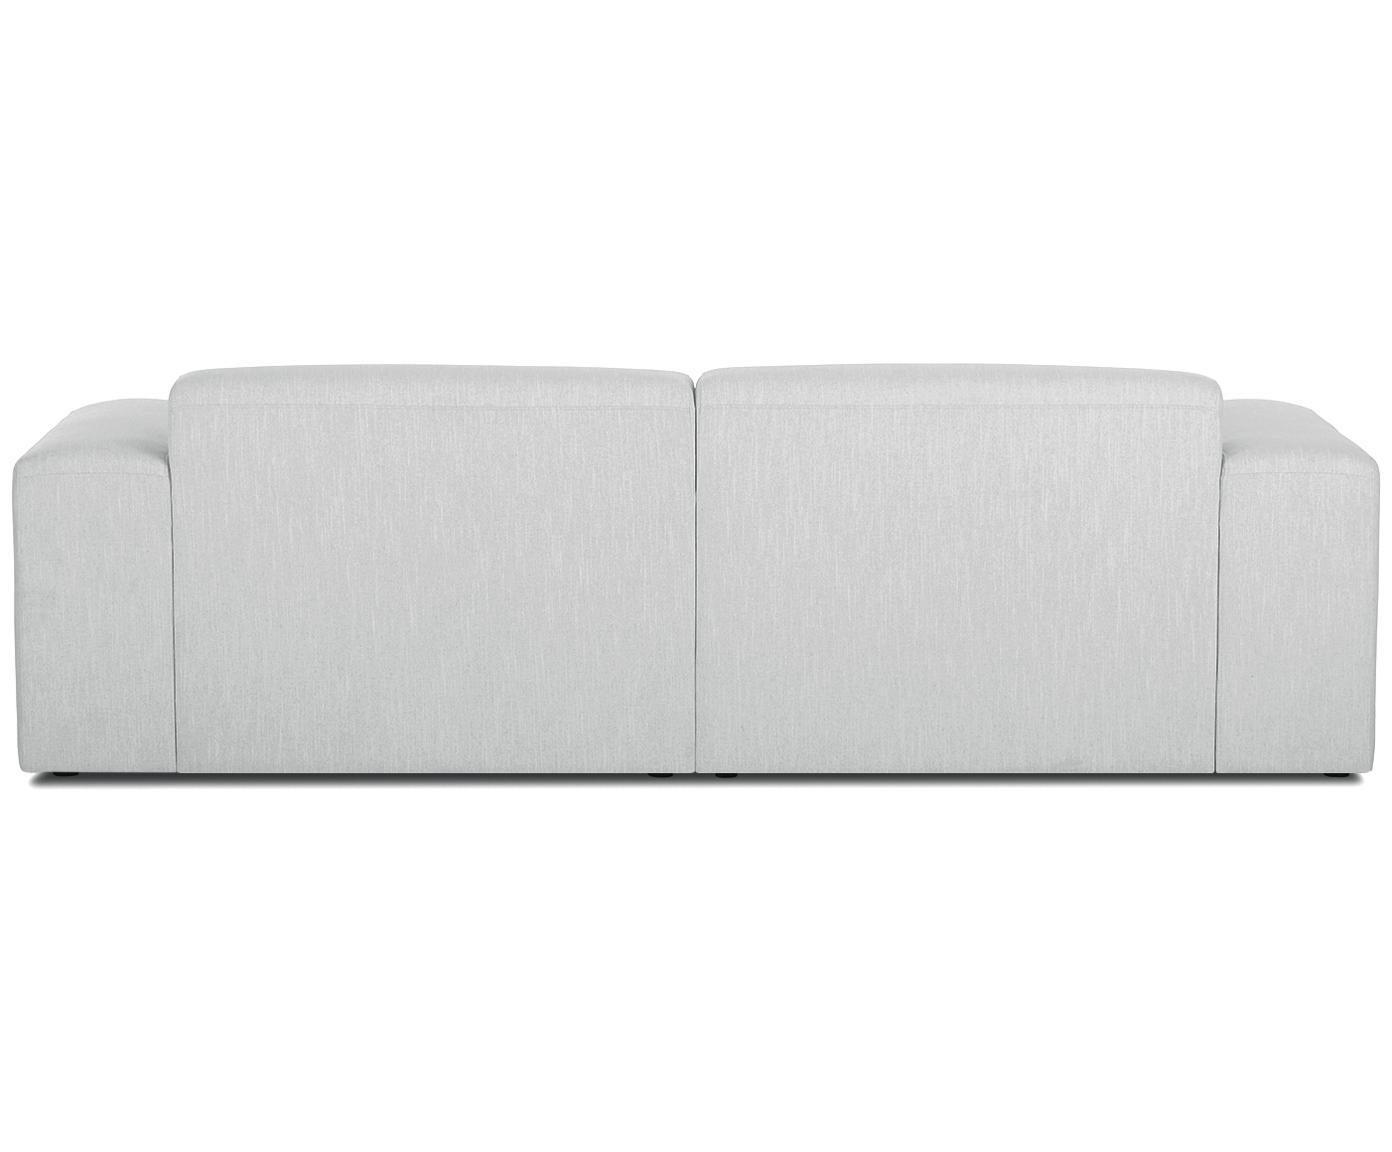 Sofa Melva (3-Sitzer), Bezug: Polyester 35.000 Scheuert, Gestell: Massives Kiefernholz, Spa, Füße: Kiefernholz, Webstoff Hellgrau, B 240 x T 101 cm